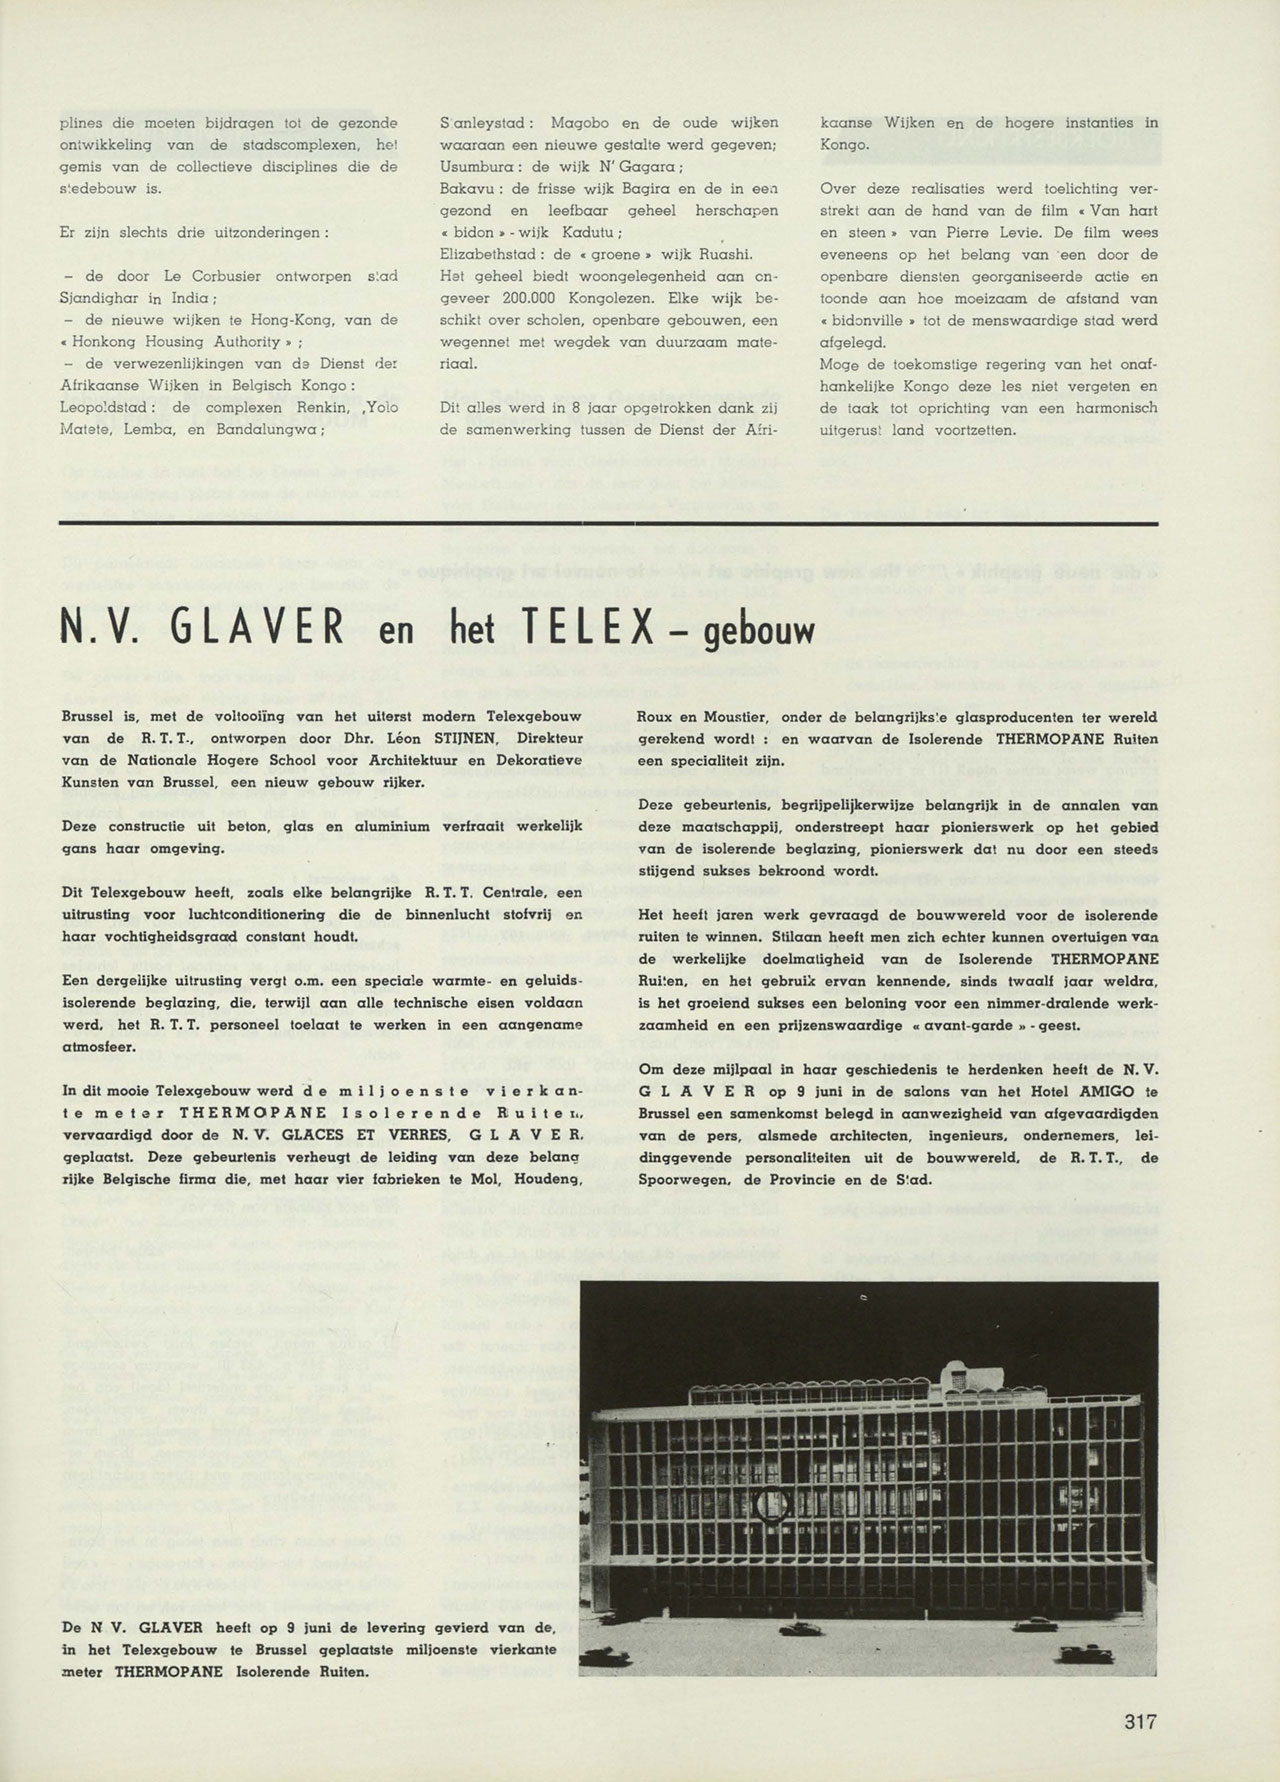 N.V. Glaver en het Telex-gebouw